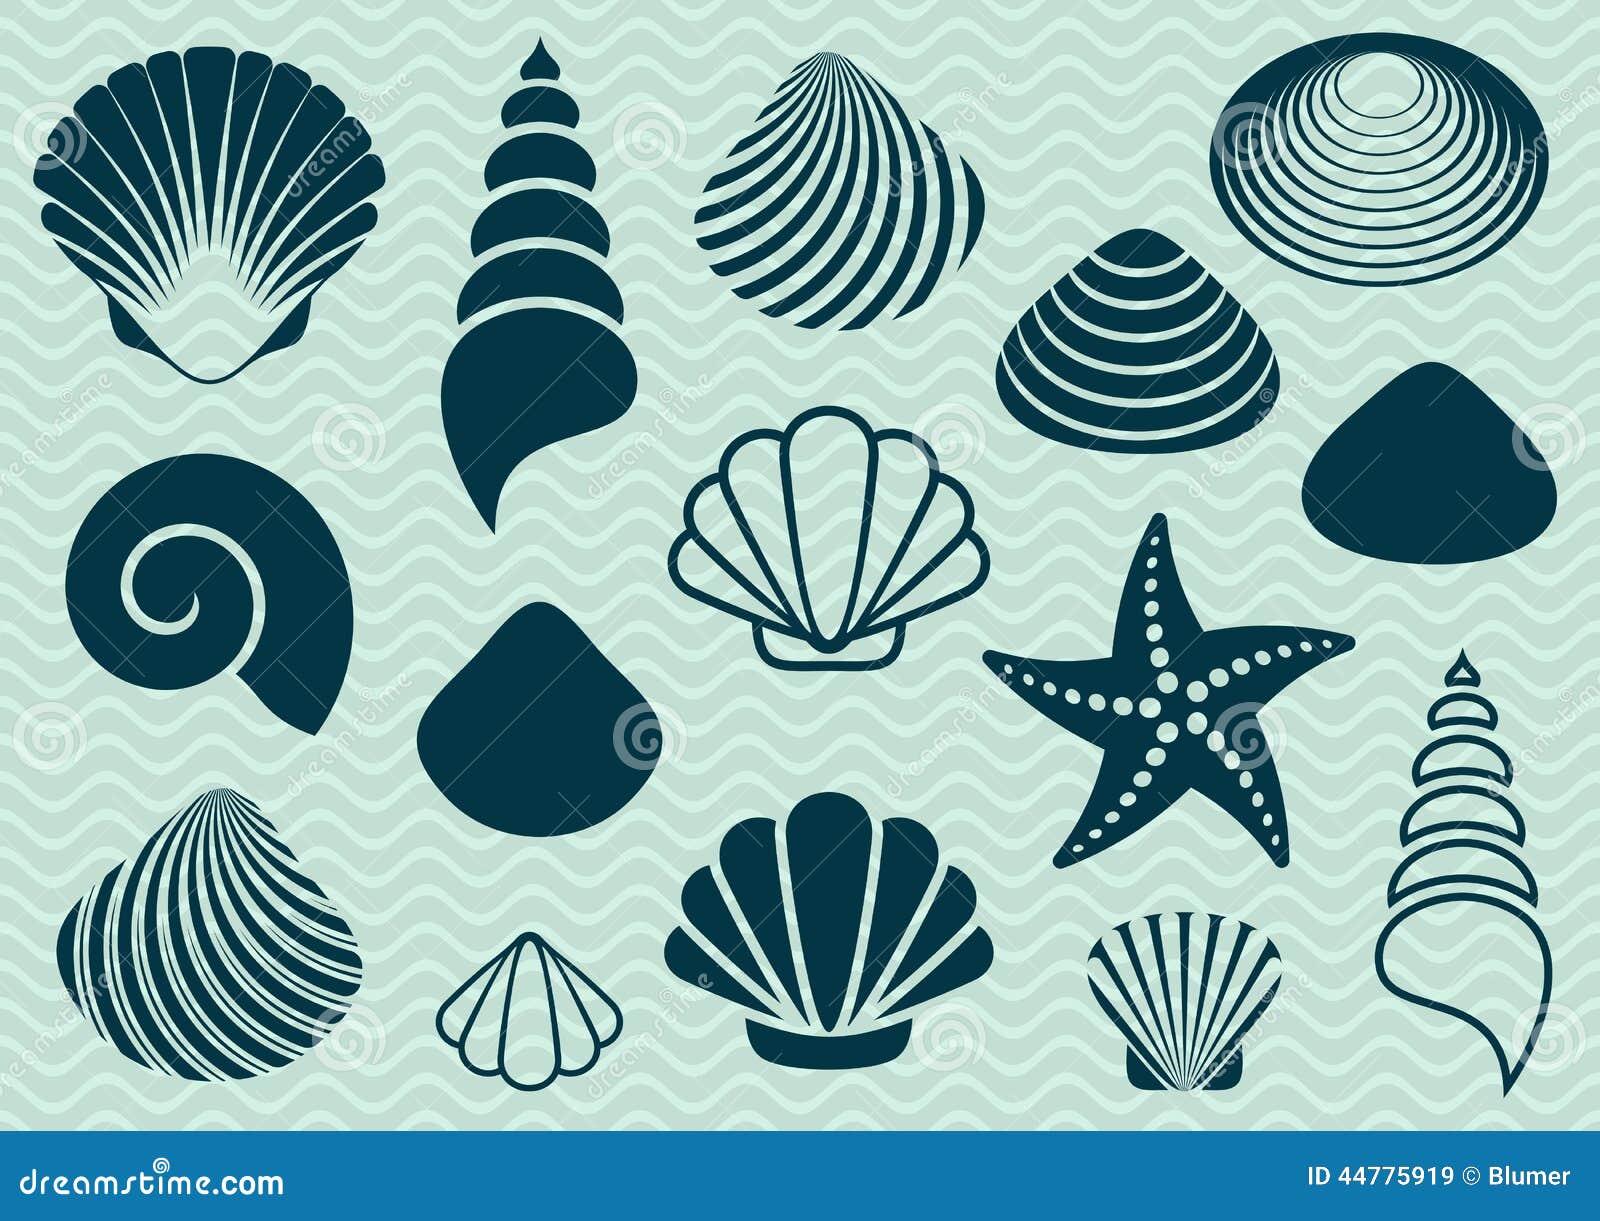 Sea Shells Stock Vector - Image: 44775919